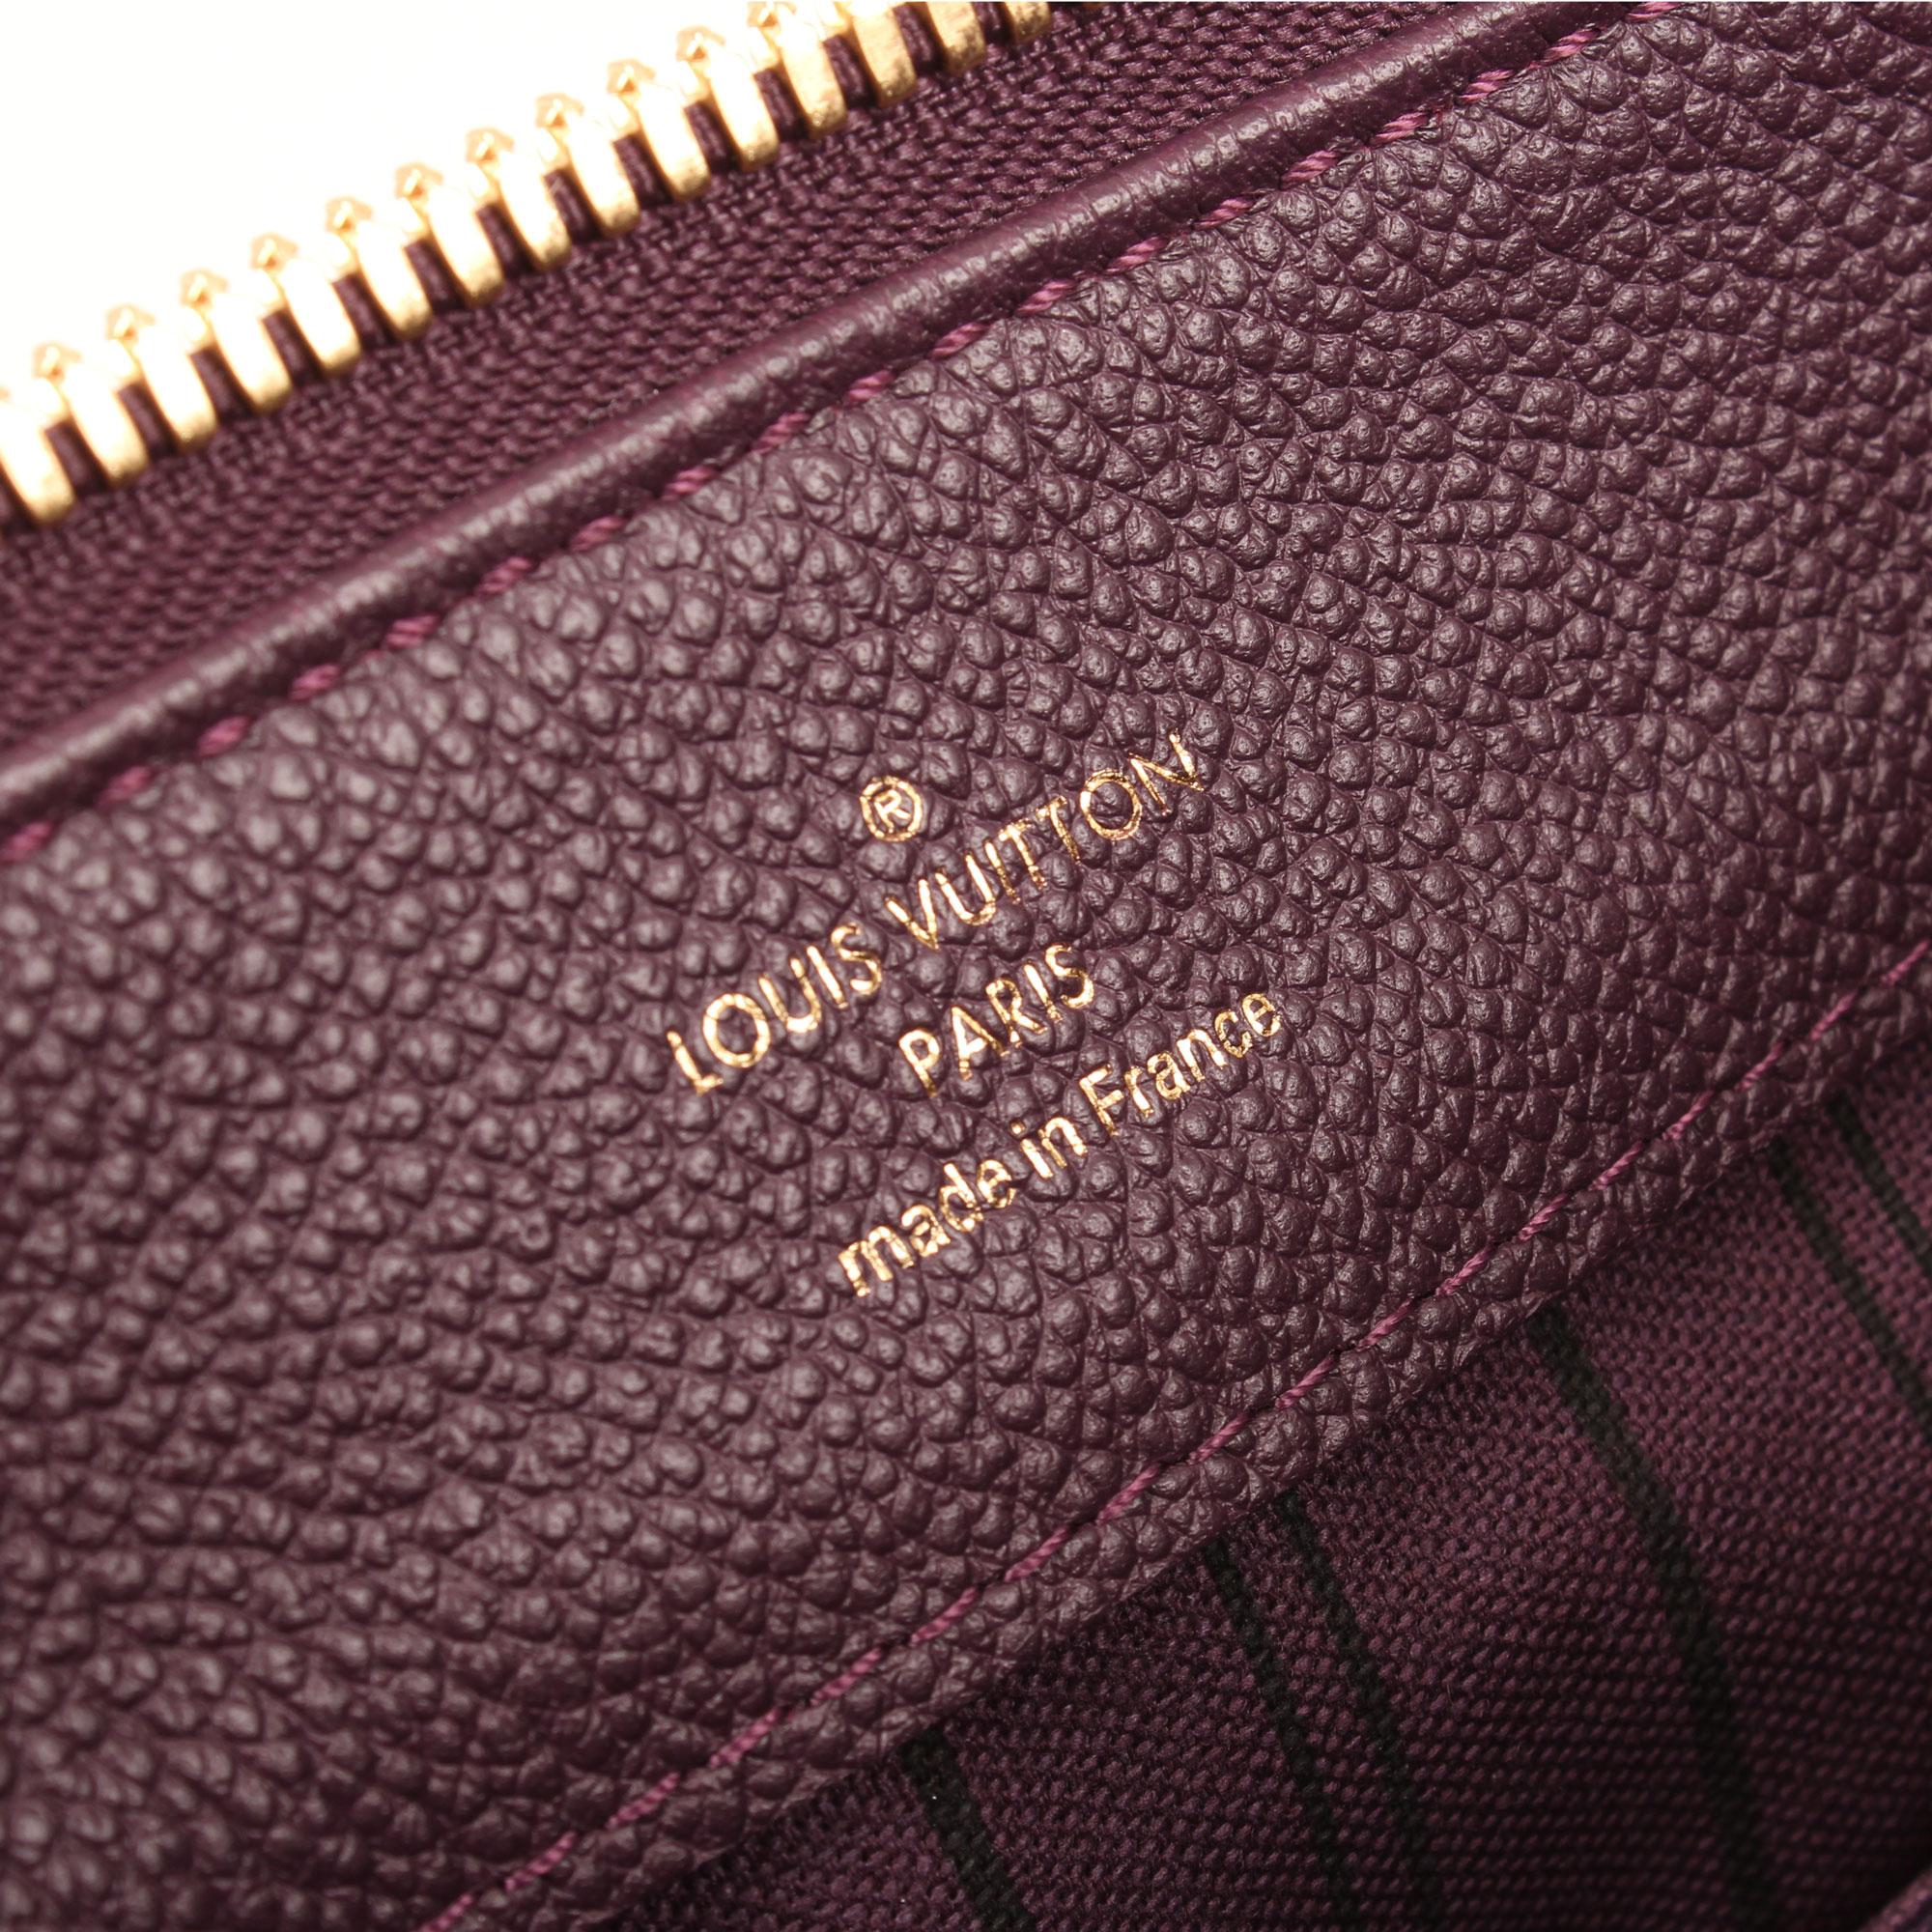 Imagen de marca del bolso louis vuitton audacieuse embossed monogram suede berenjena